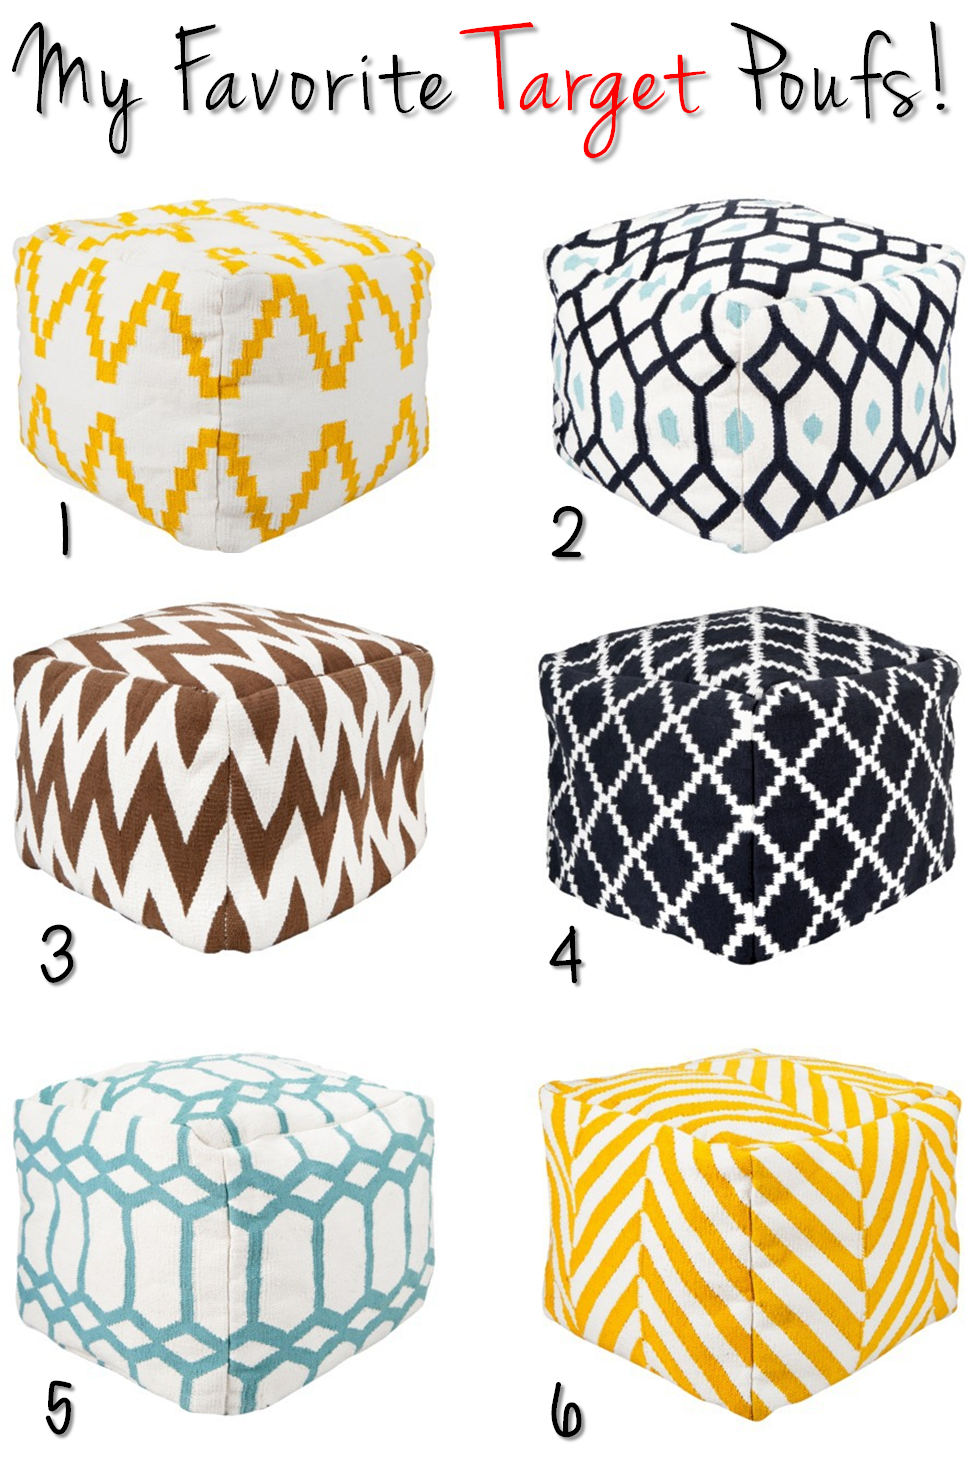 target poufs.png 188×18,18 pixels | Home Decor I love | Pinterest ...